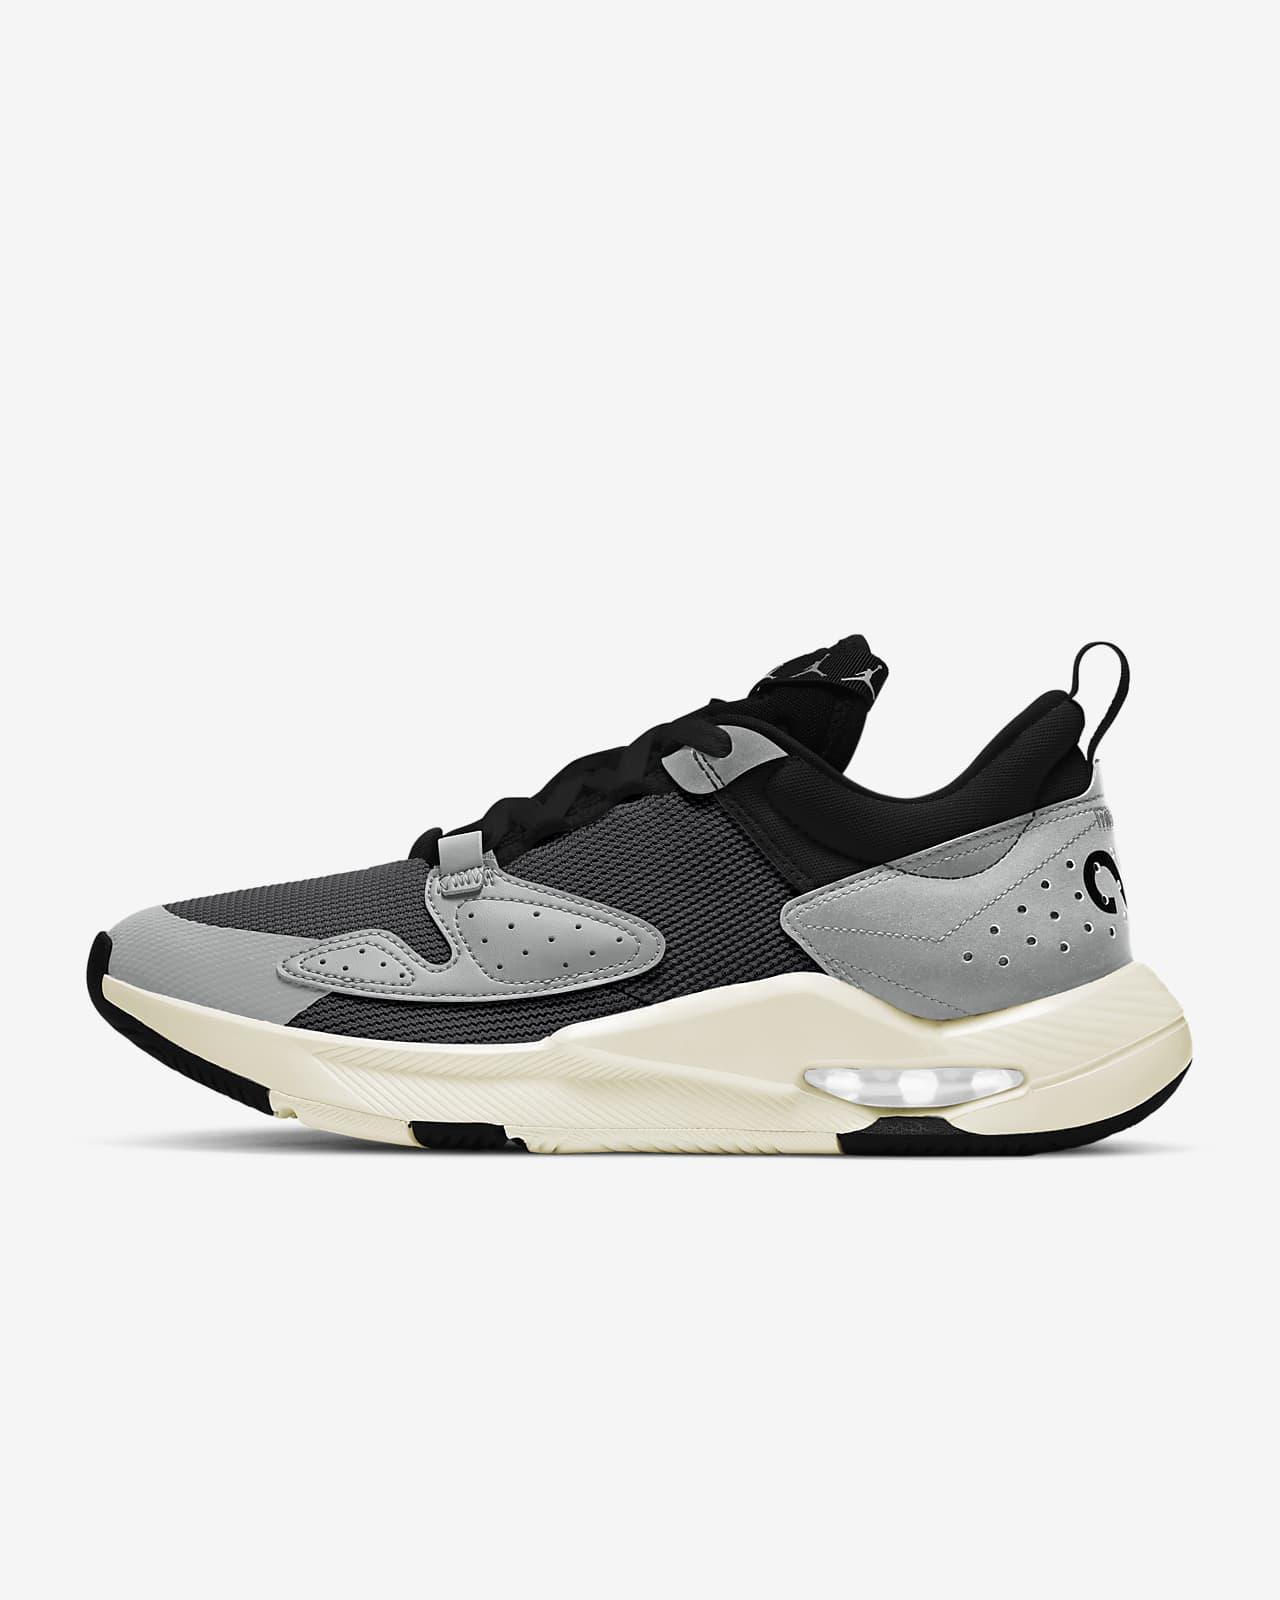 Chaussure Jordan Air Cadence pour Homme